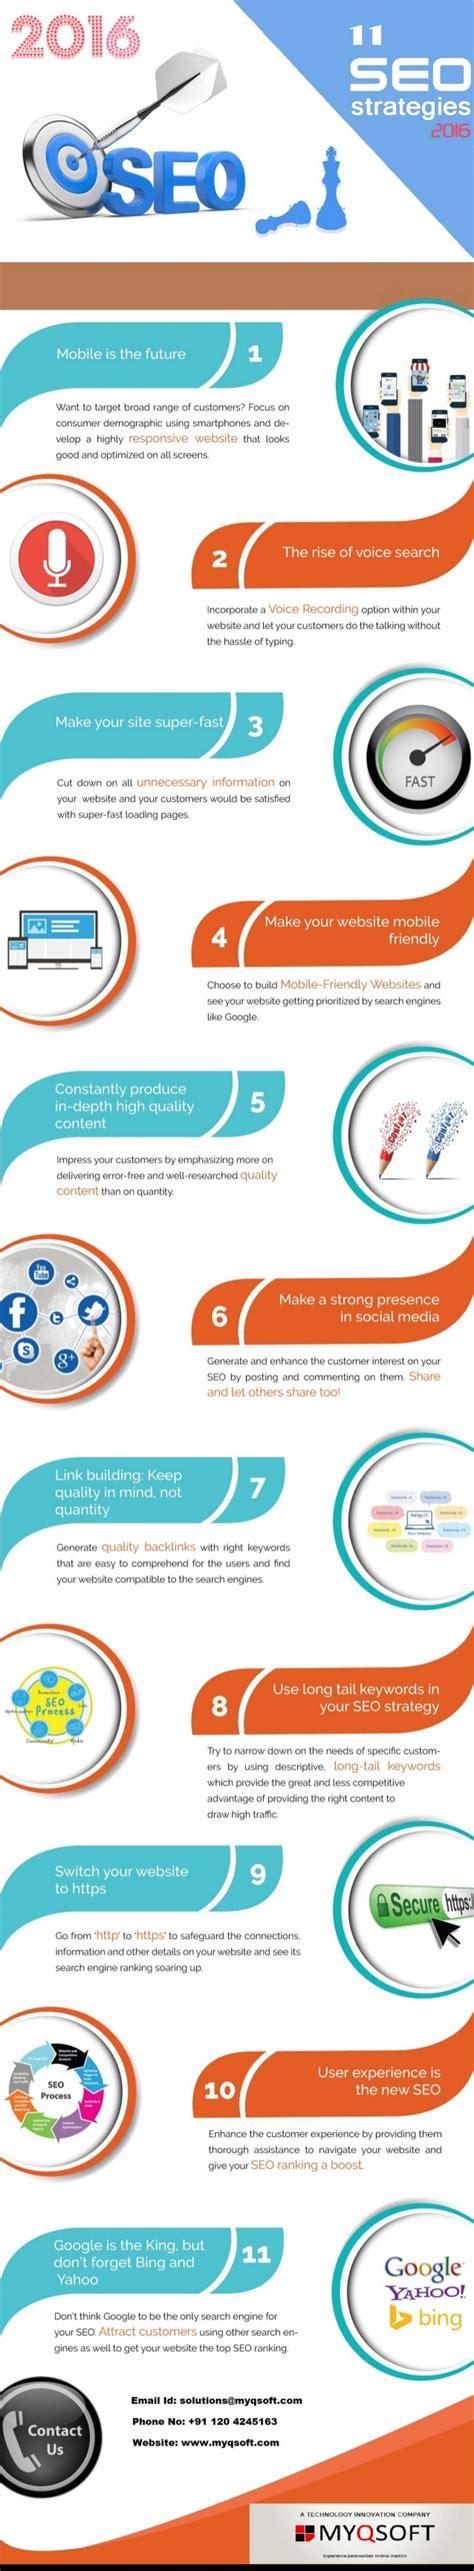 Seo Strategy 2016 by 11 Seo Strategies 2016 Myqsoft